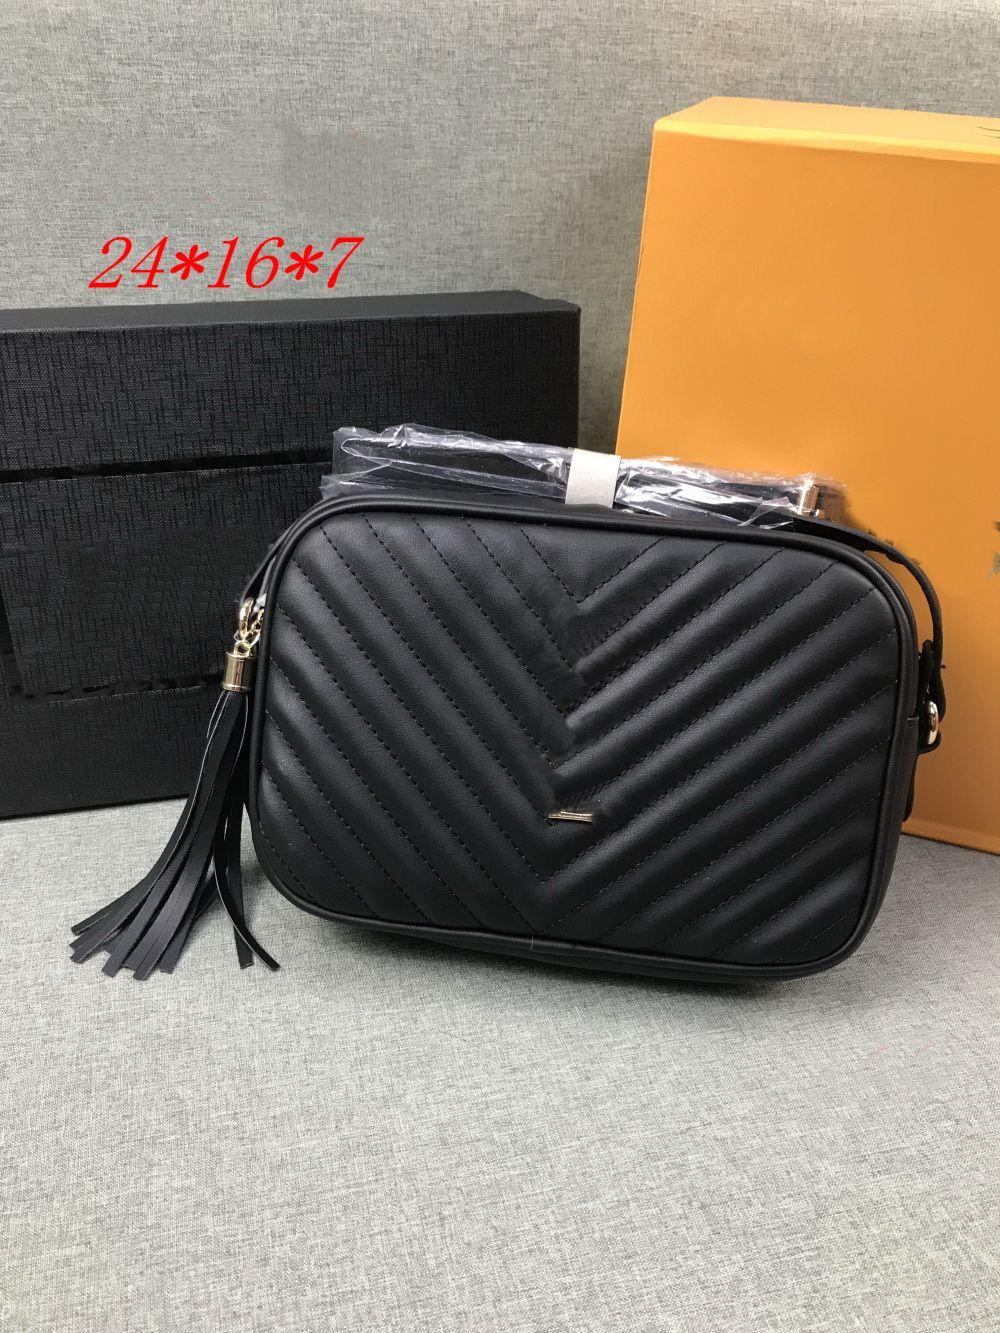 Top Quality Handbag Wallet Handbaga Womens Bolsas Moda Sacos Cross Body Soho Baga Disco Saco De Ombro Fringed Messenger Bagse Bagse 24 cm